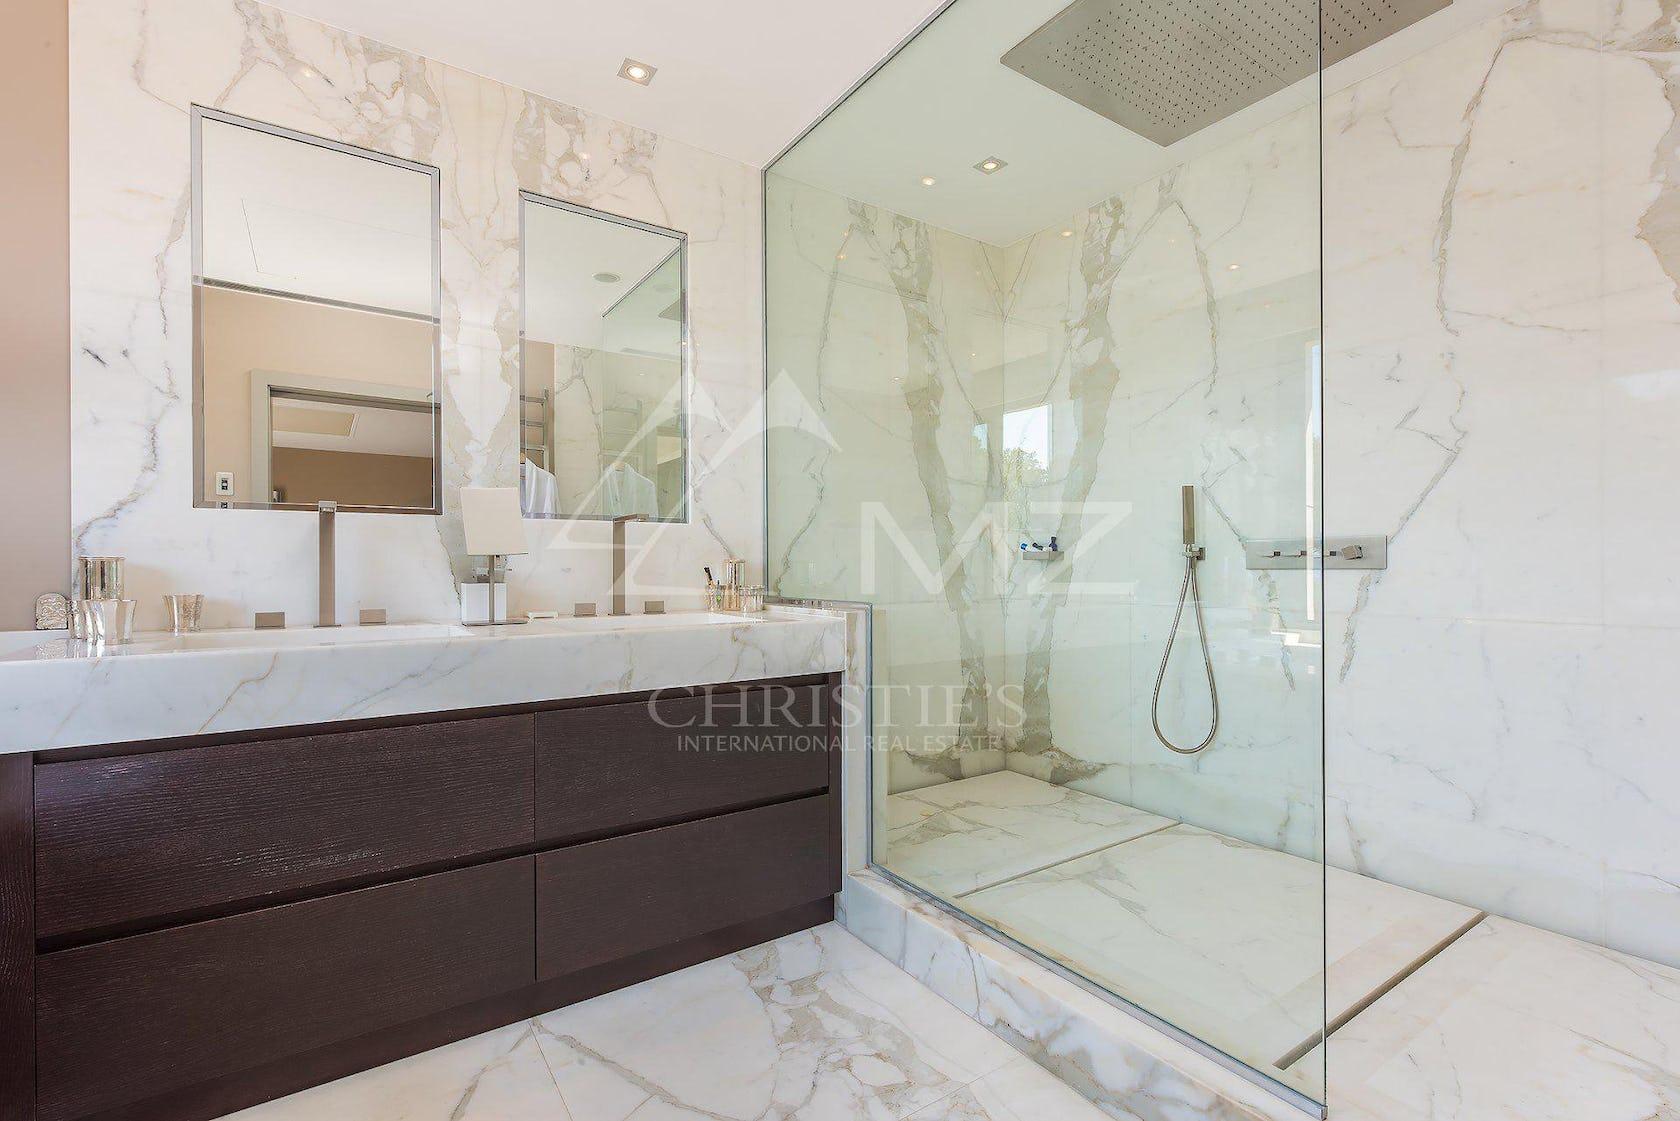 room indoors bathroom interior design tub